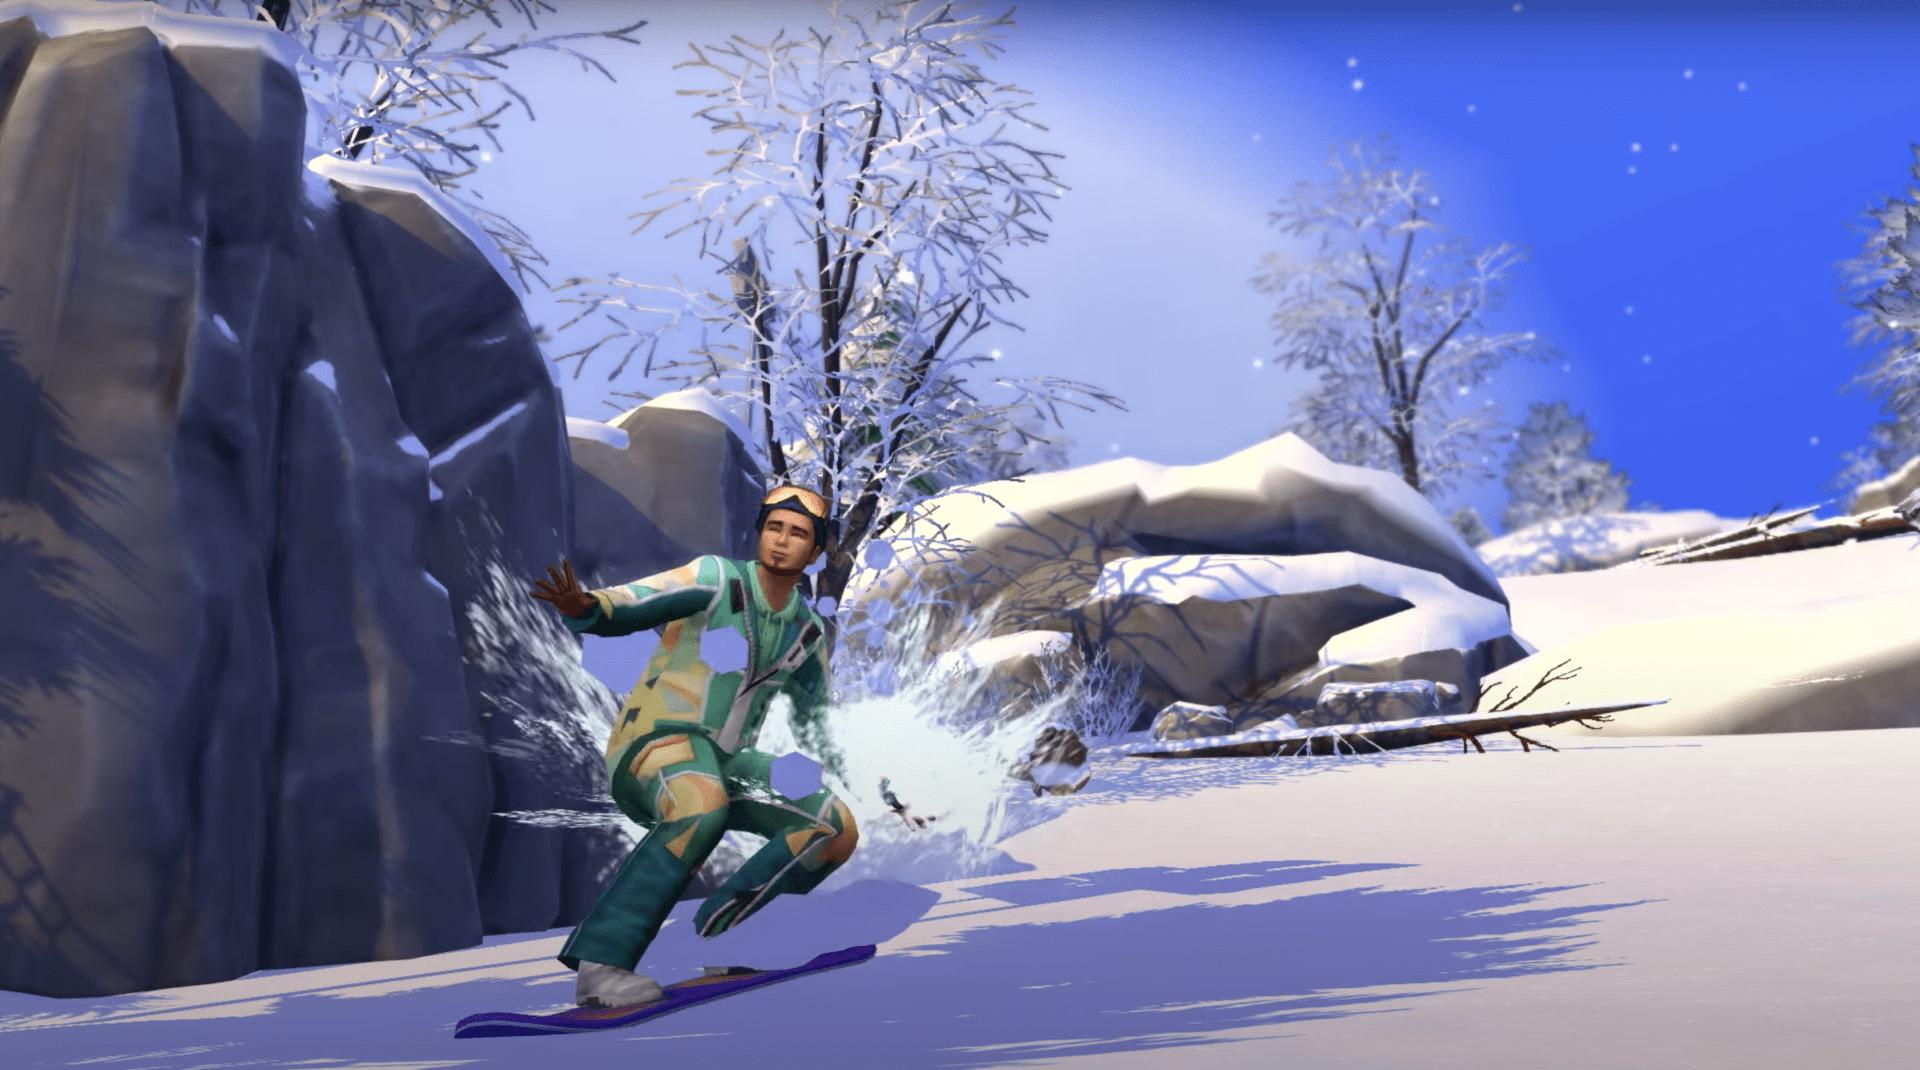 Snowy Escape Gameplay Trailer